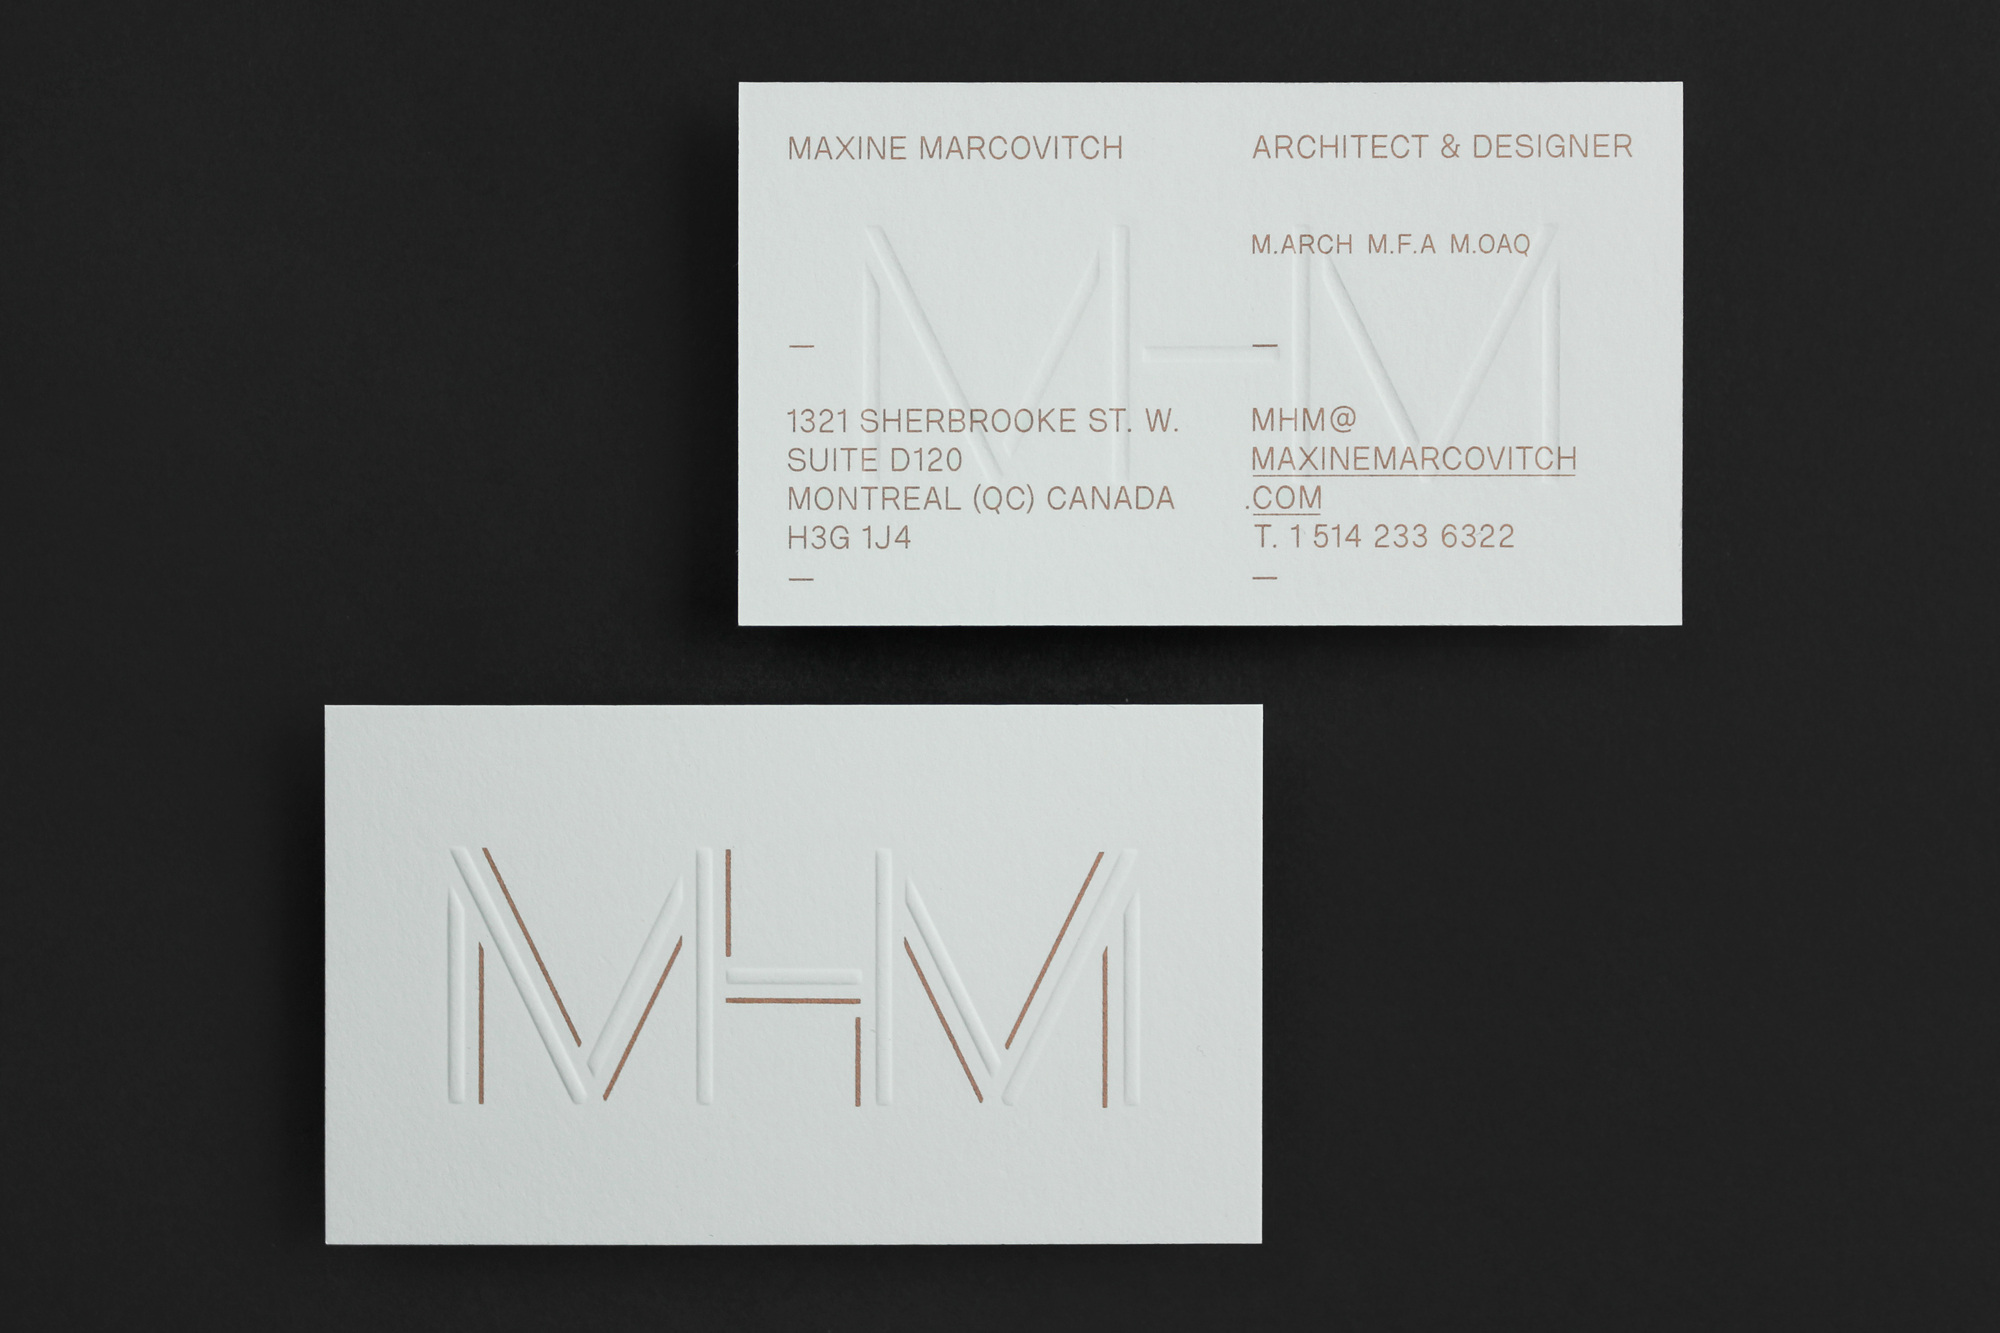 MHM Architect